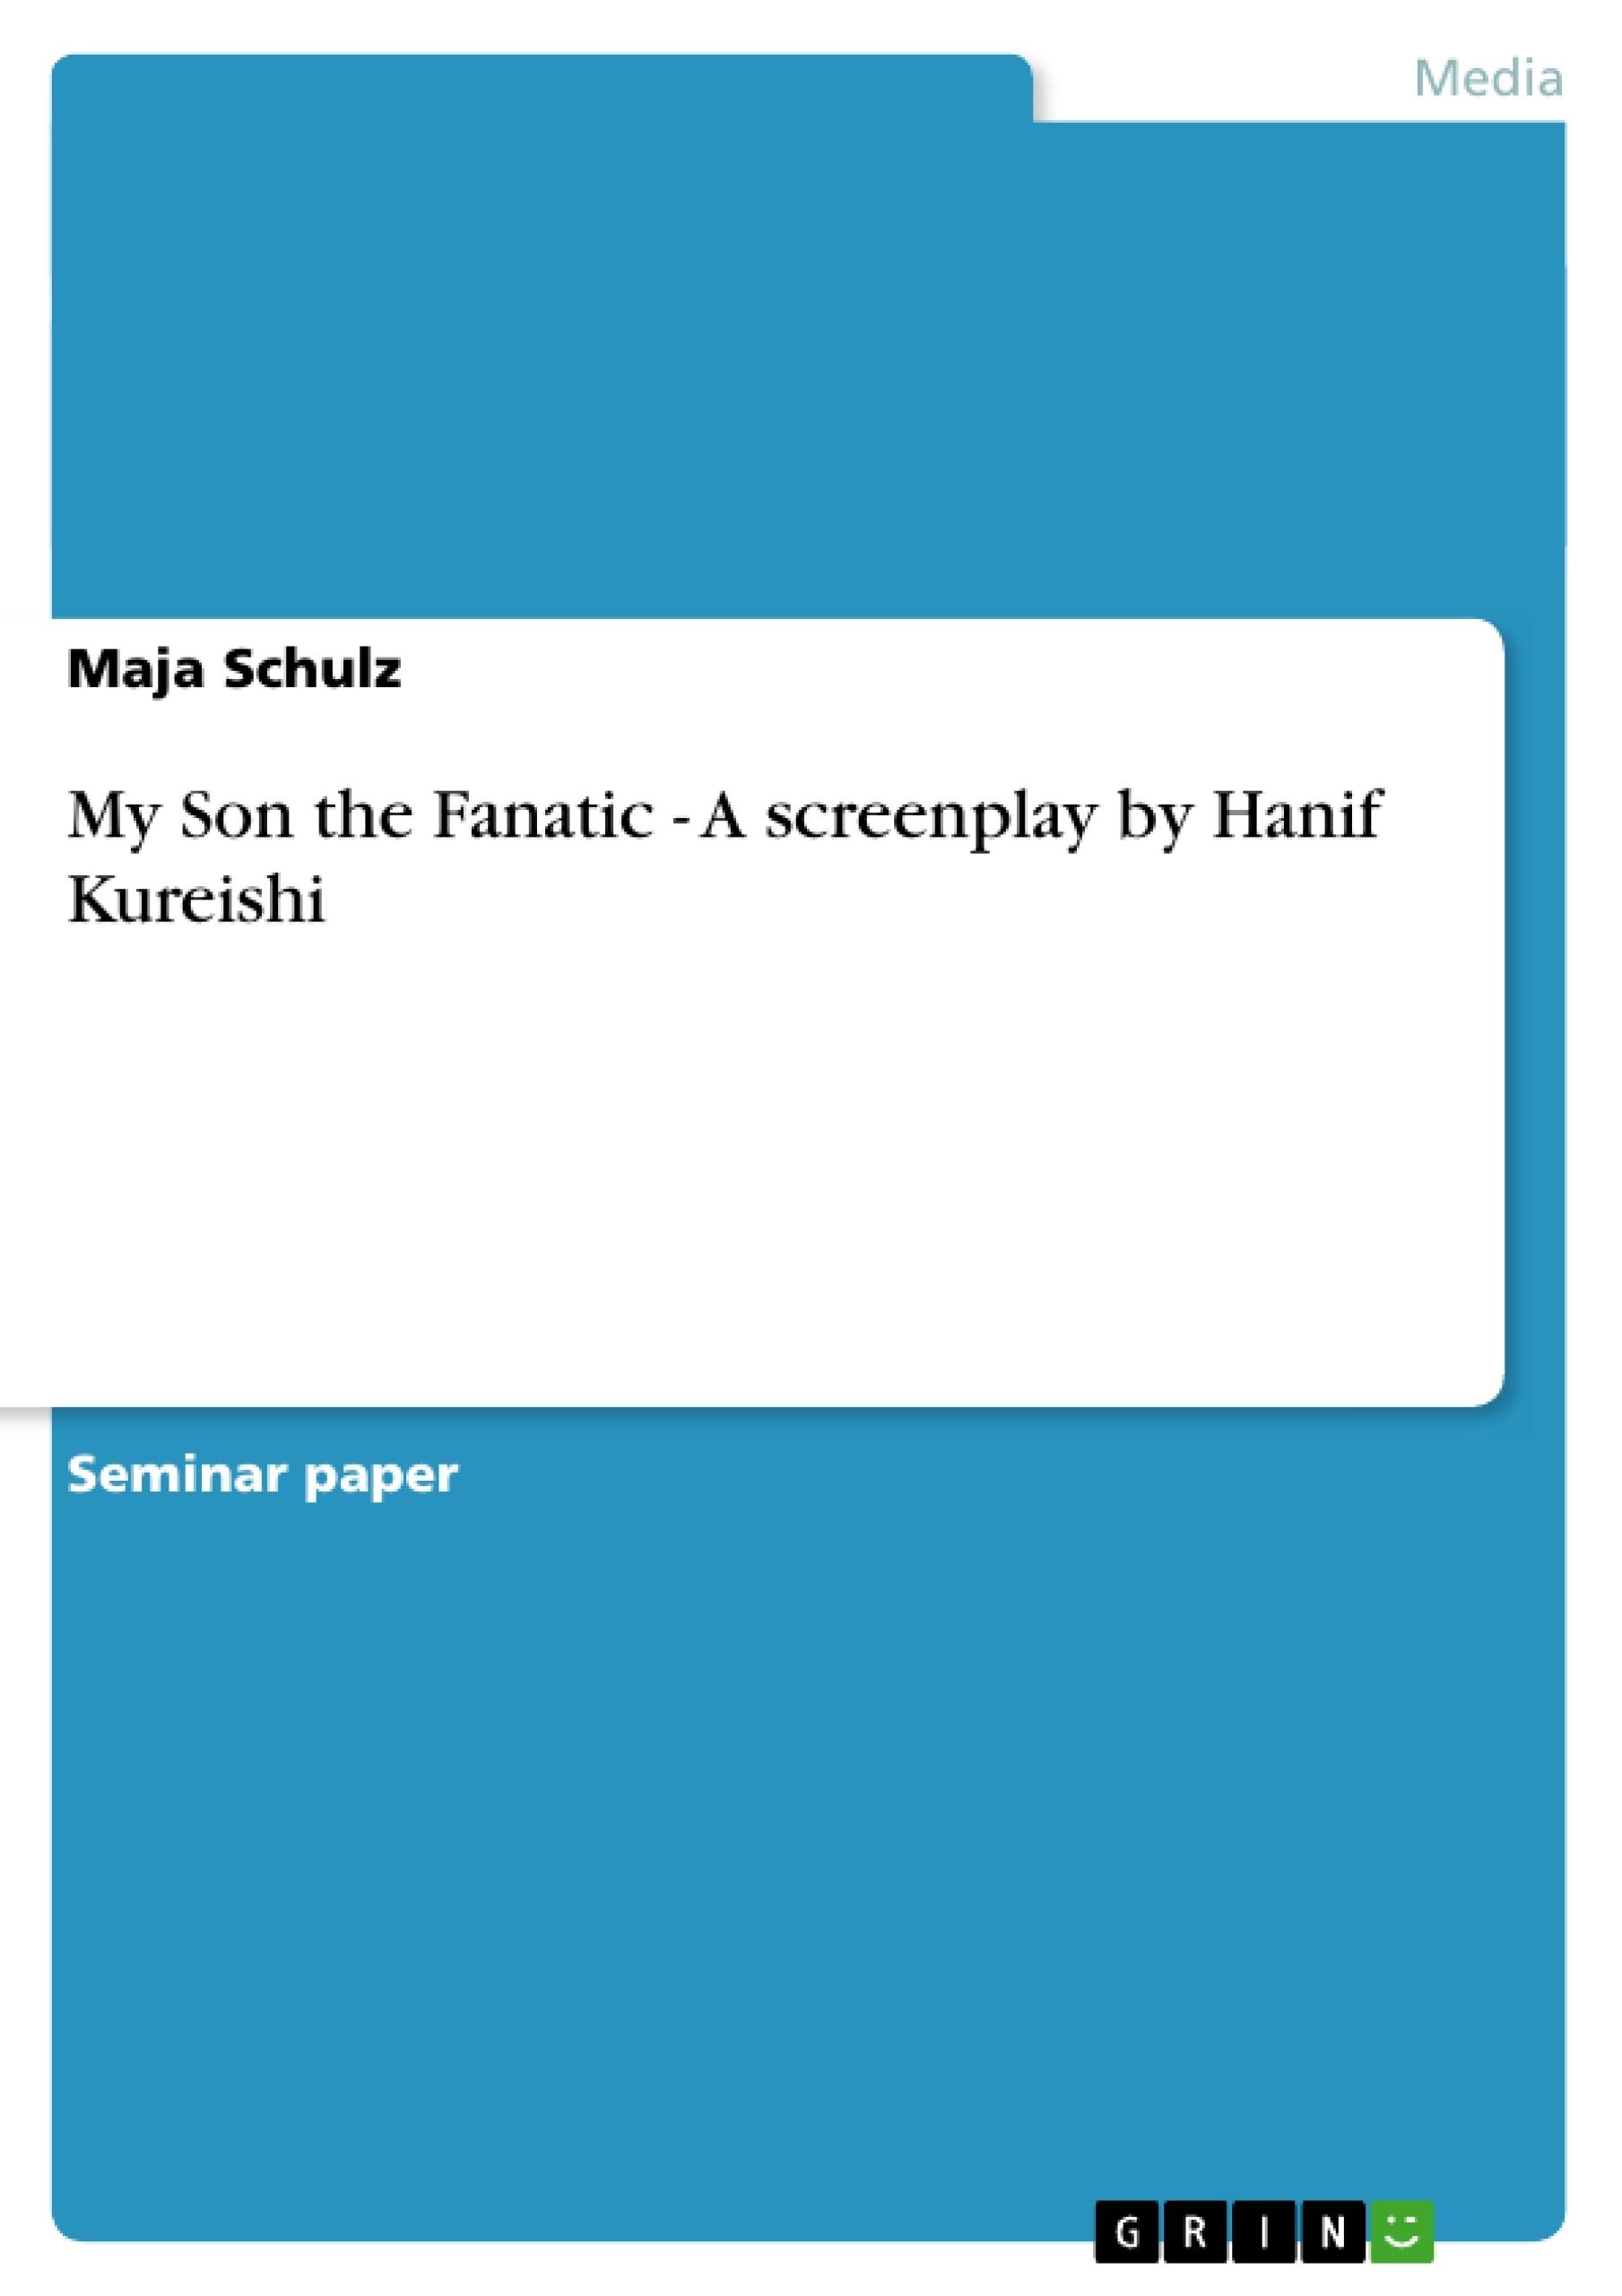 Title: My Son the Fanatic - A screenplay by Hanif Kureishi